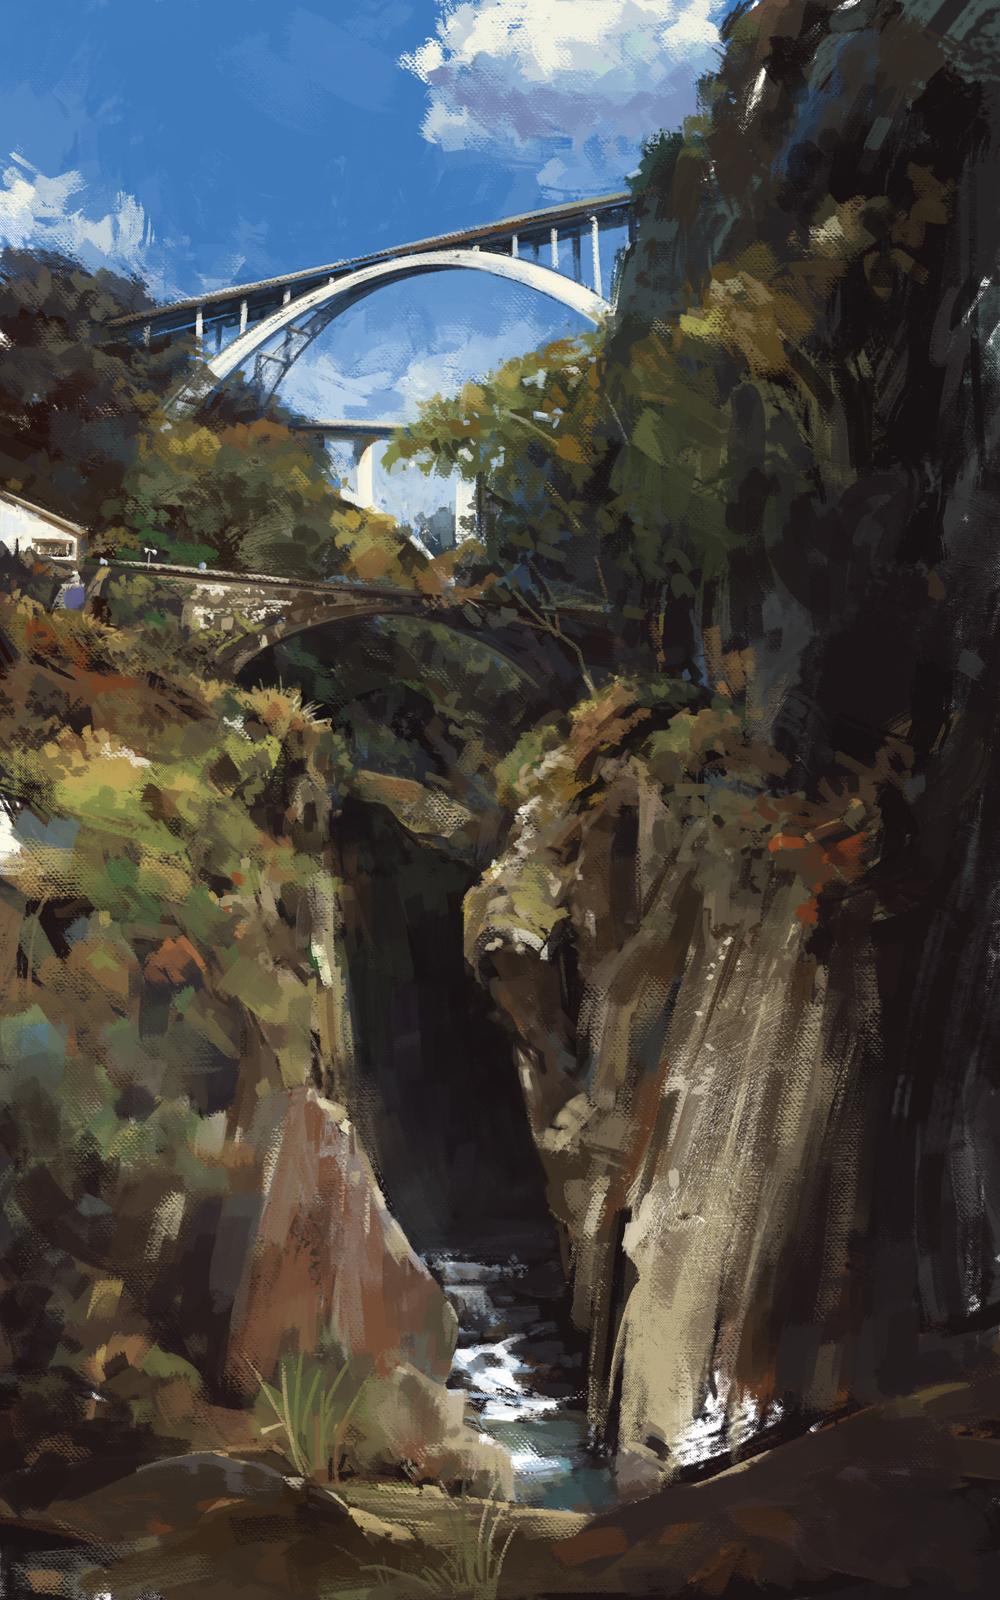 Takachiho Gorge - Kyushu by alantsuei